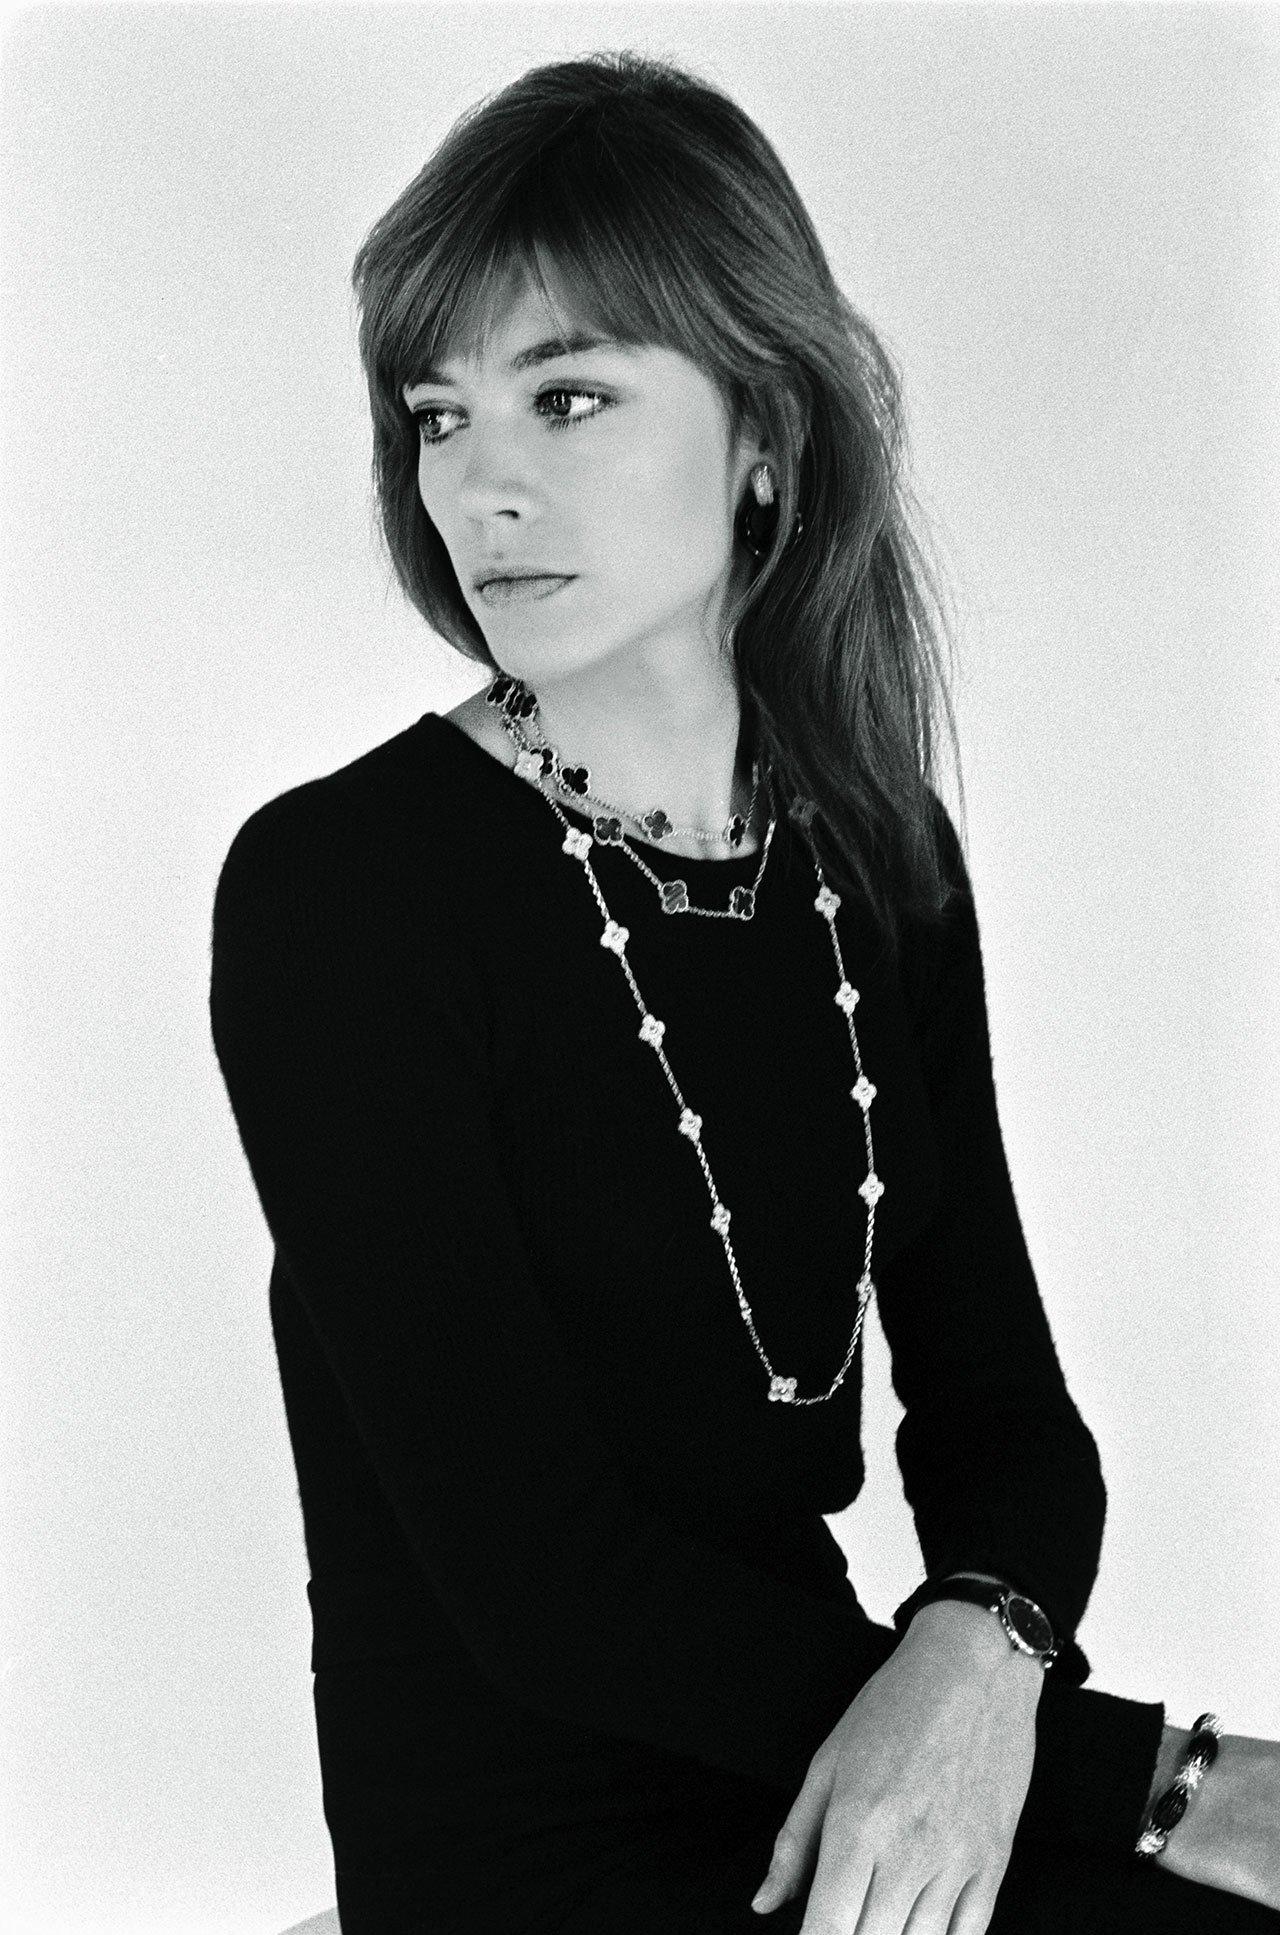 Françoise Hardywearing Alhambra collection necklaces photographedbyCatherine Rotulo, 1974.© Catherine Rotulo.